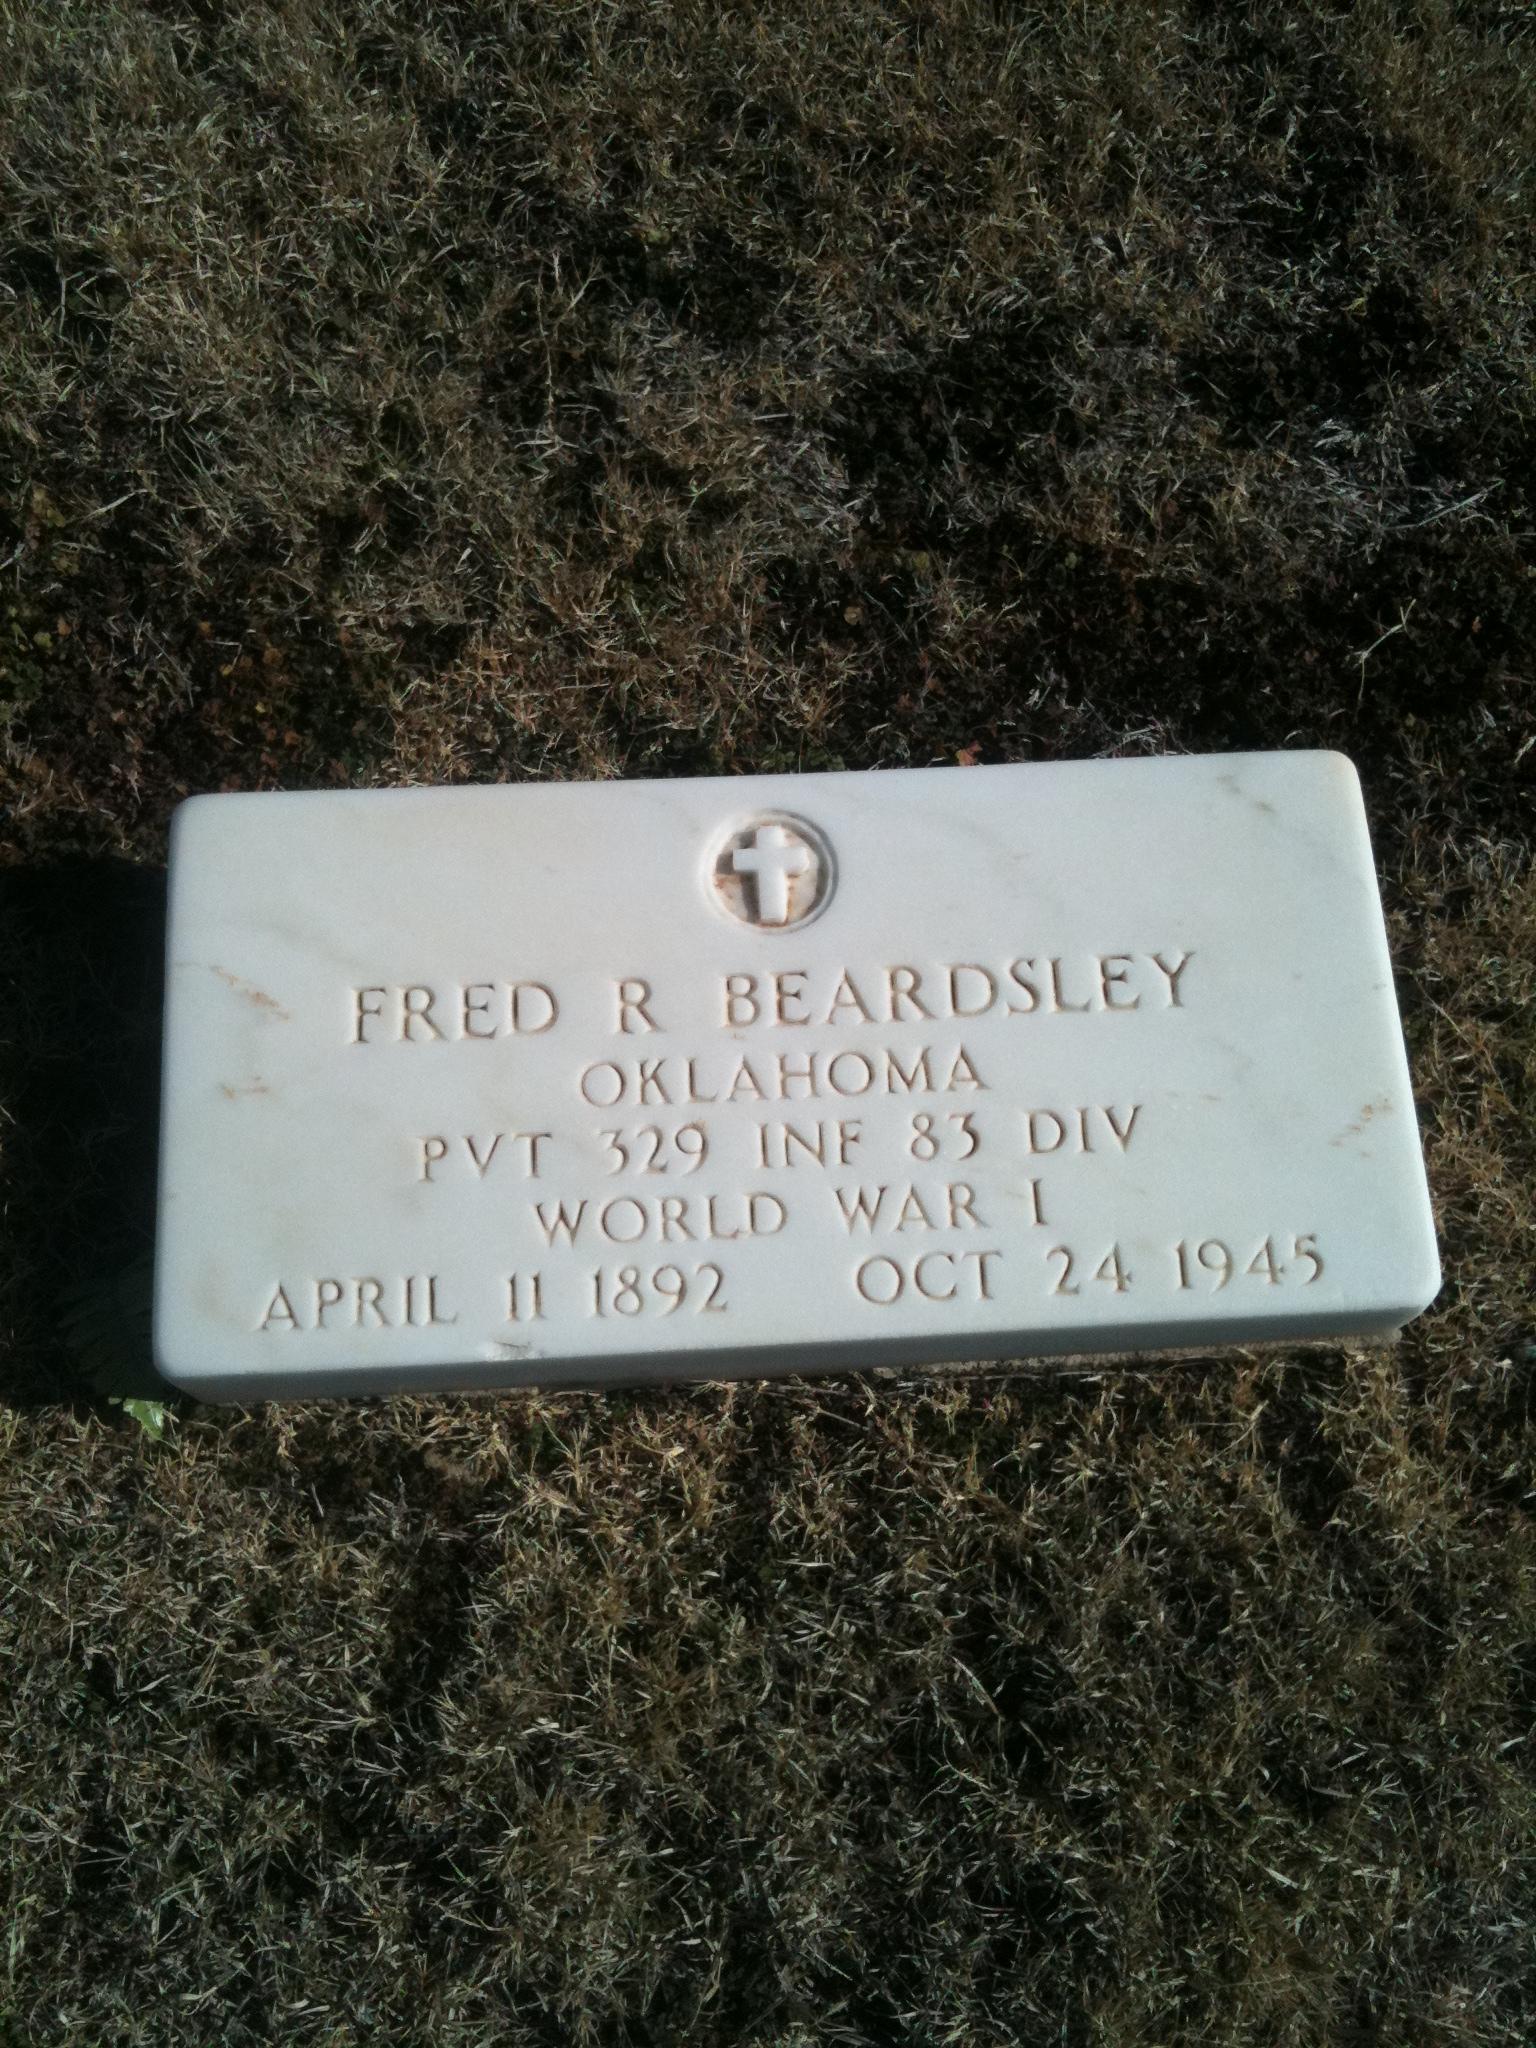 Fred P Beardsley P Beardsley